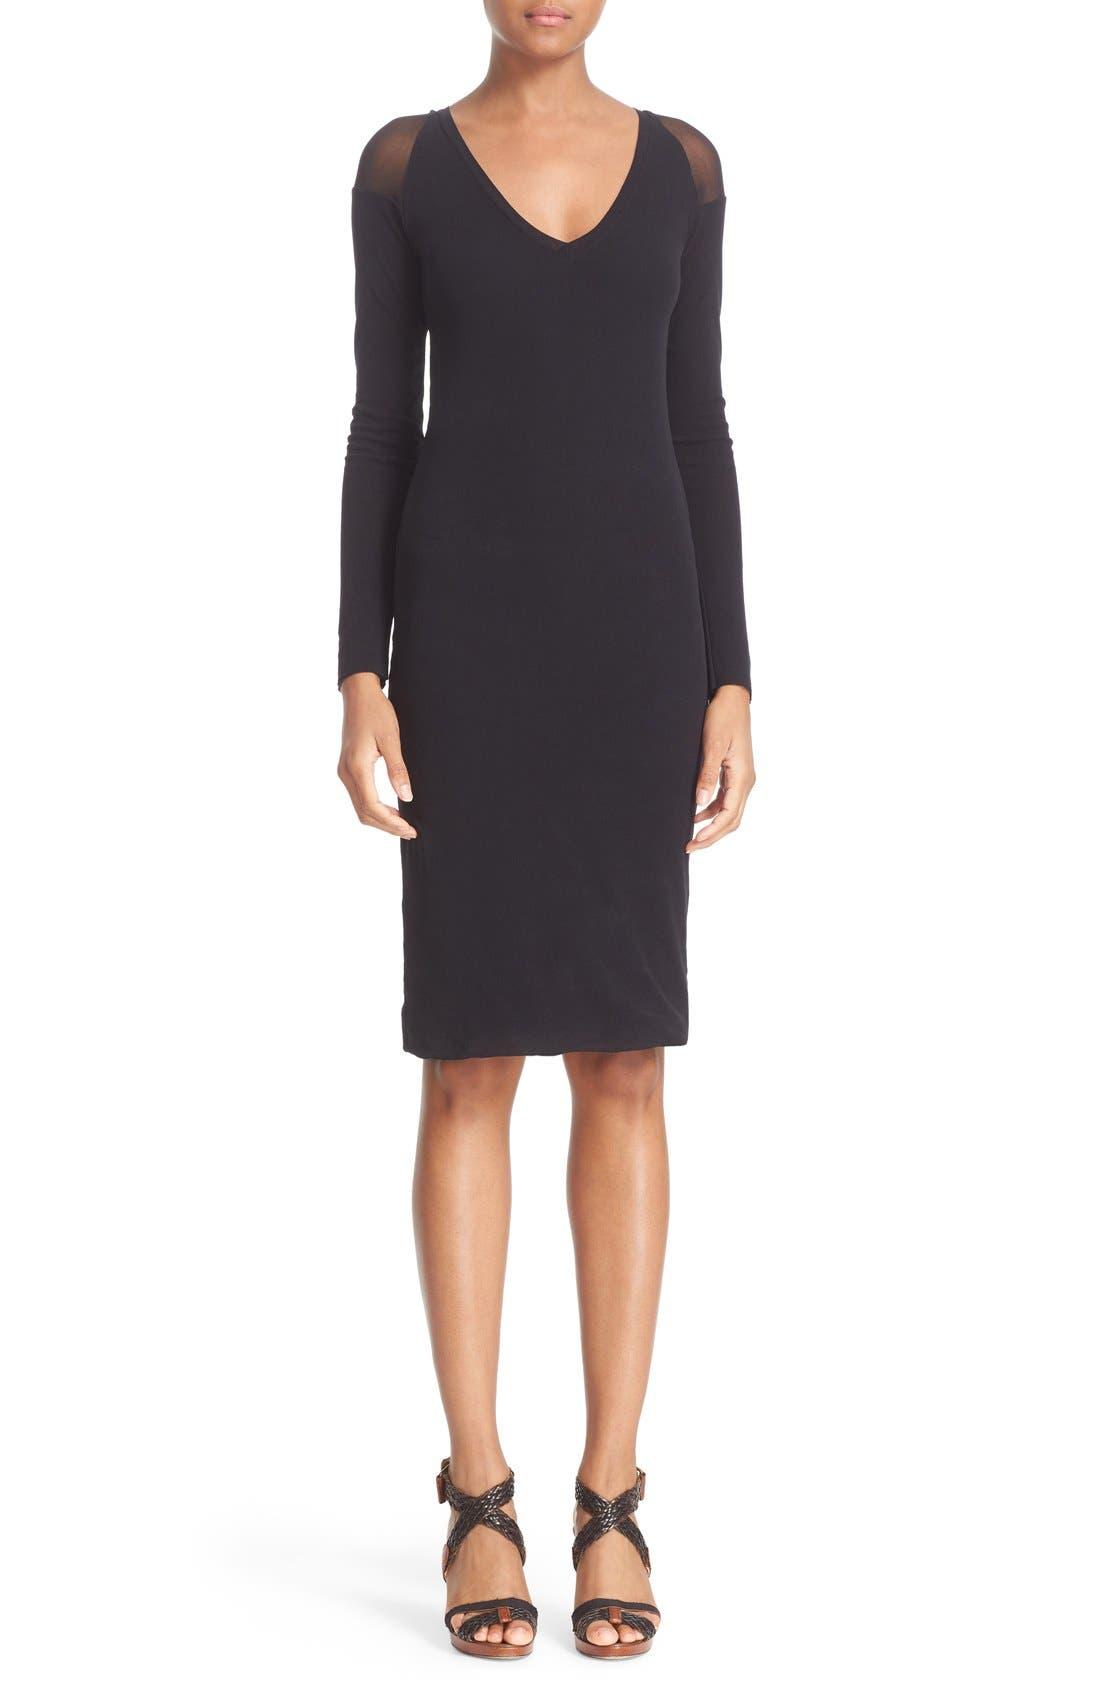 Alternate Image 1 Selected - Fuzzi Illusion Cold Shoulder Sheath Dress